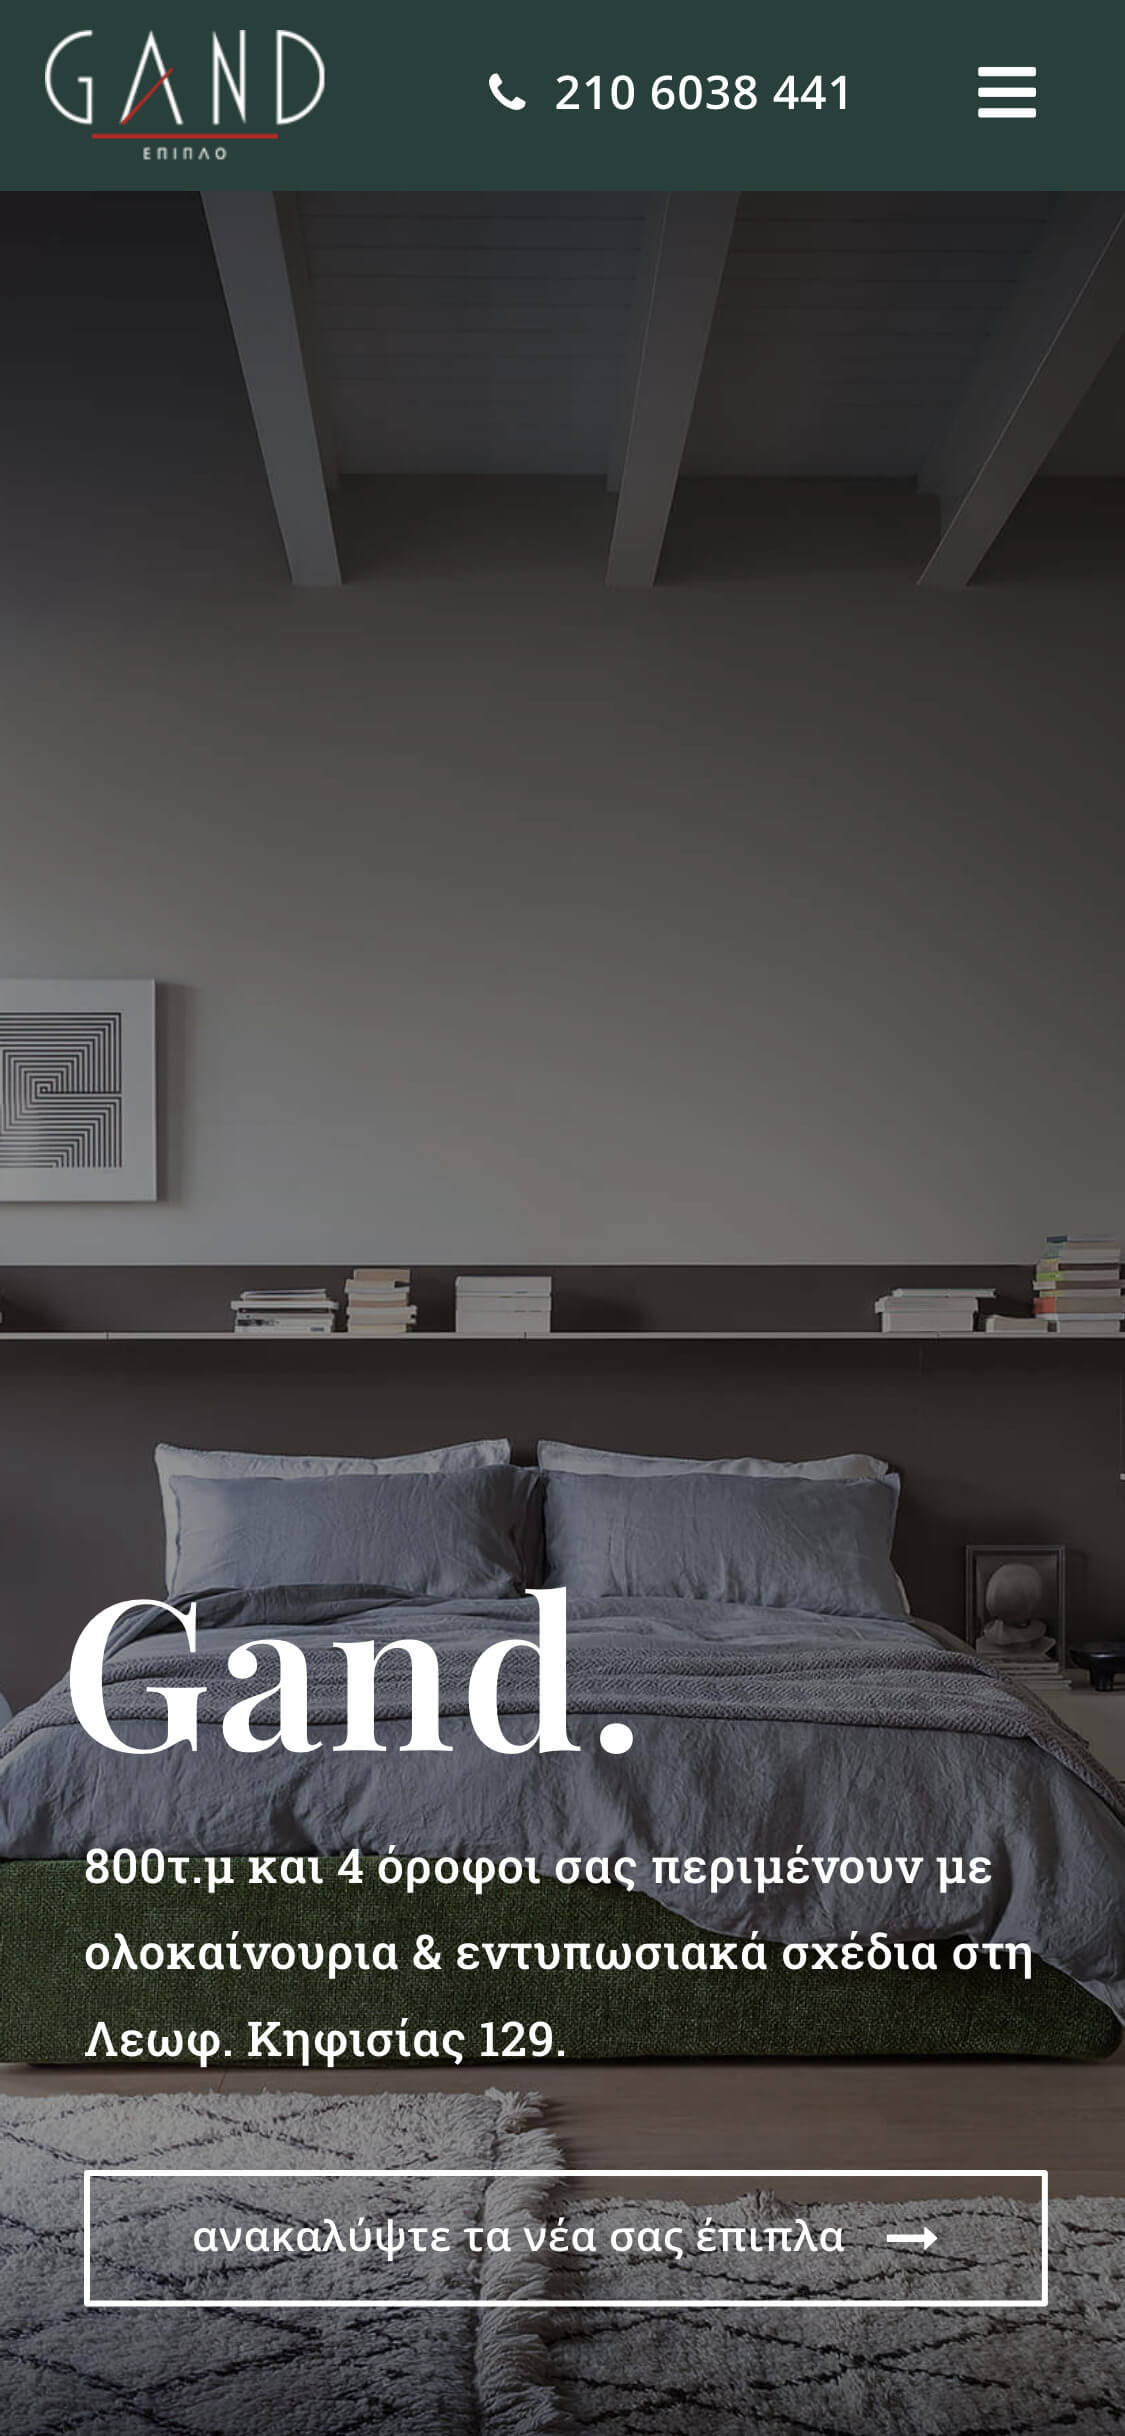 WordPress Website Design & Development - Mobile Mockup - GAND Furniture